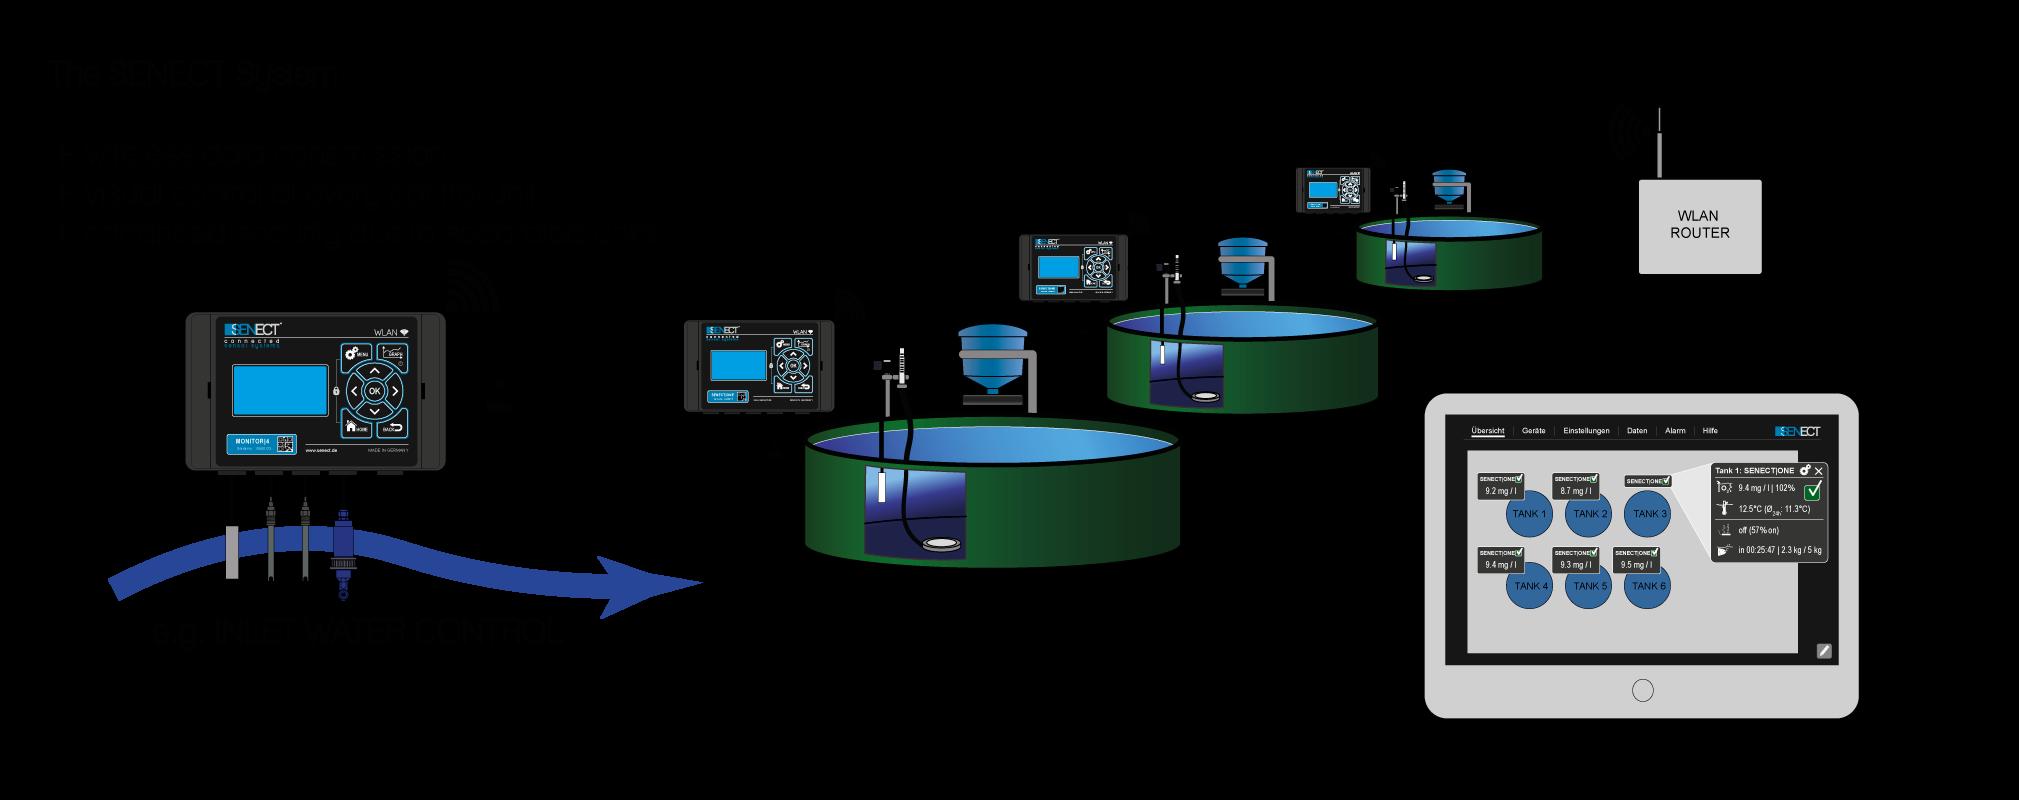 Senect-System_Monitor4_en